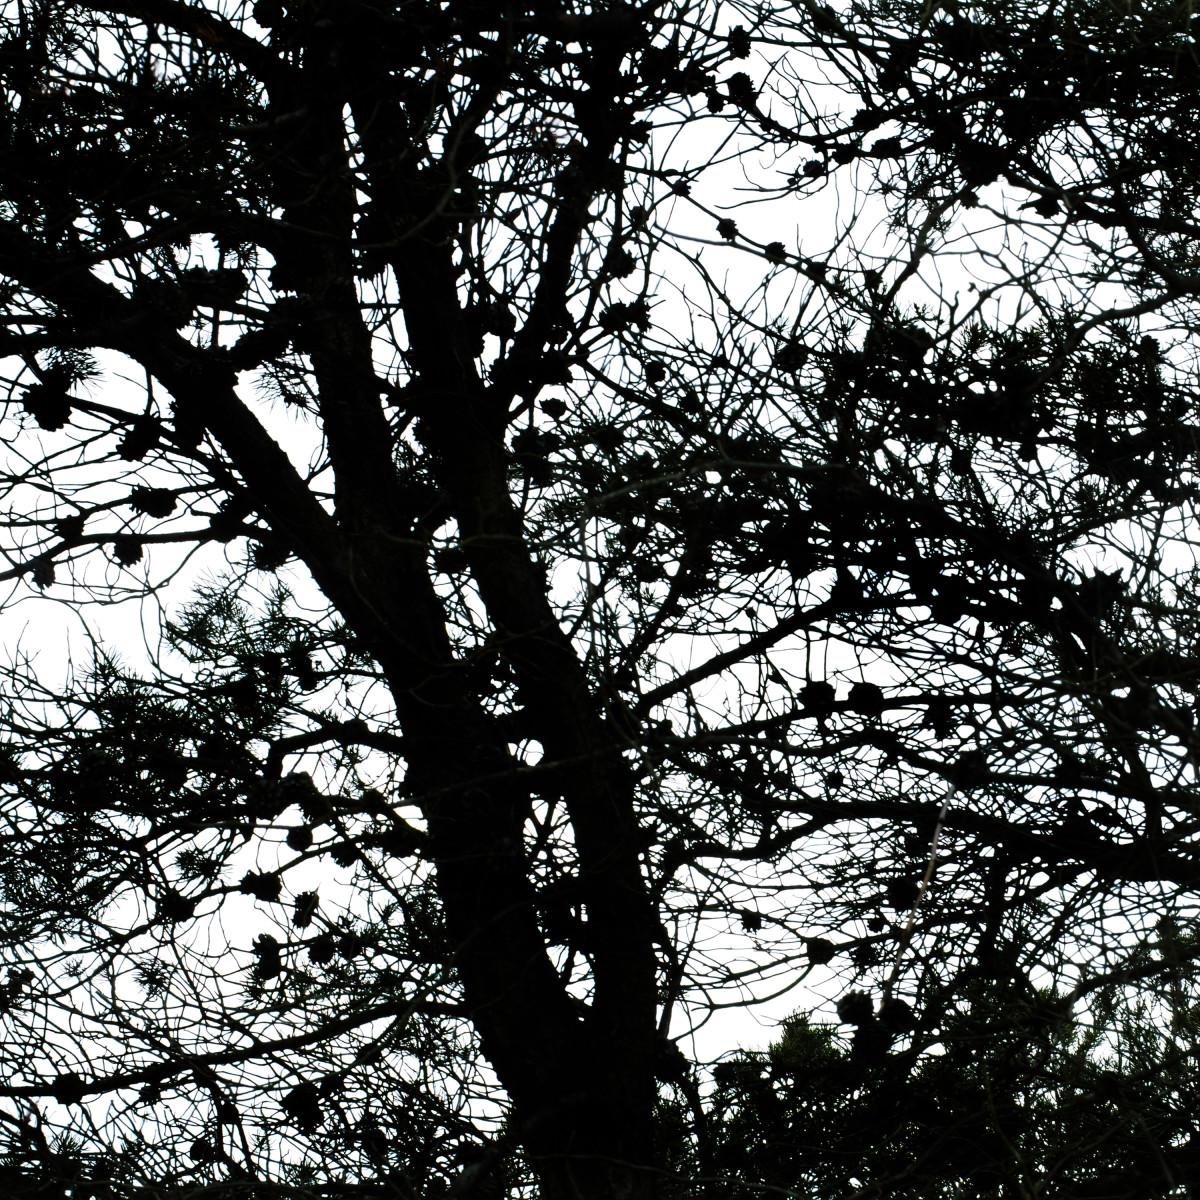 JACK PINE SEED CONES REMAIN INDEFINETLY ON TREE